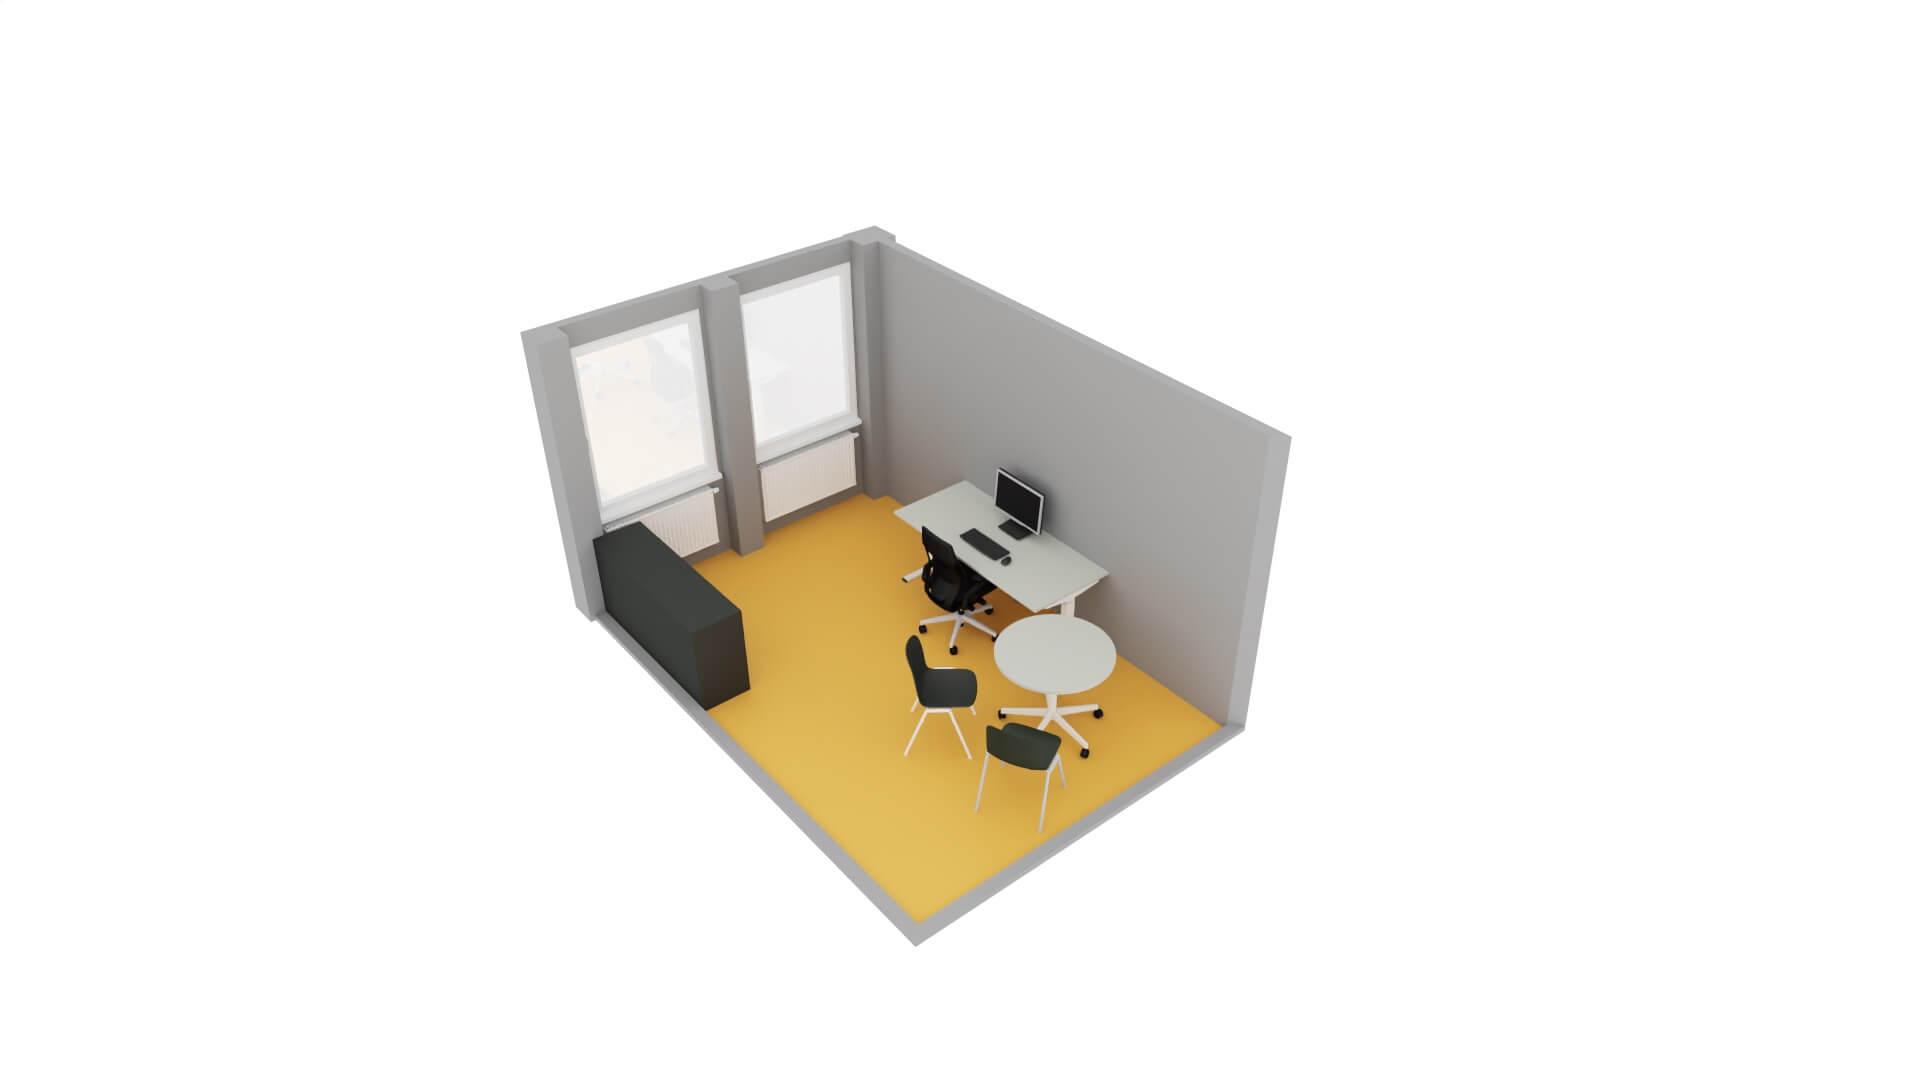 Zellenbüro